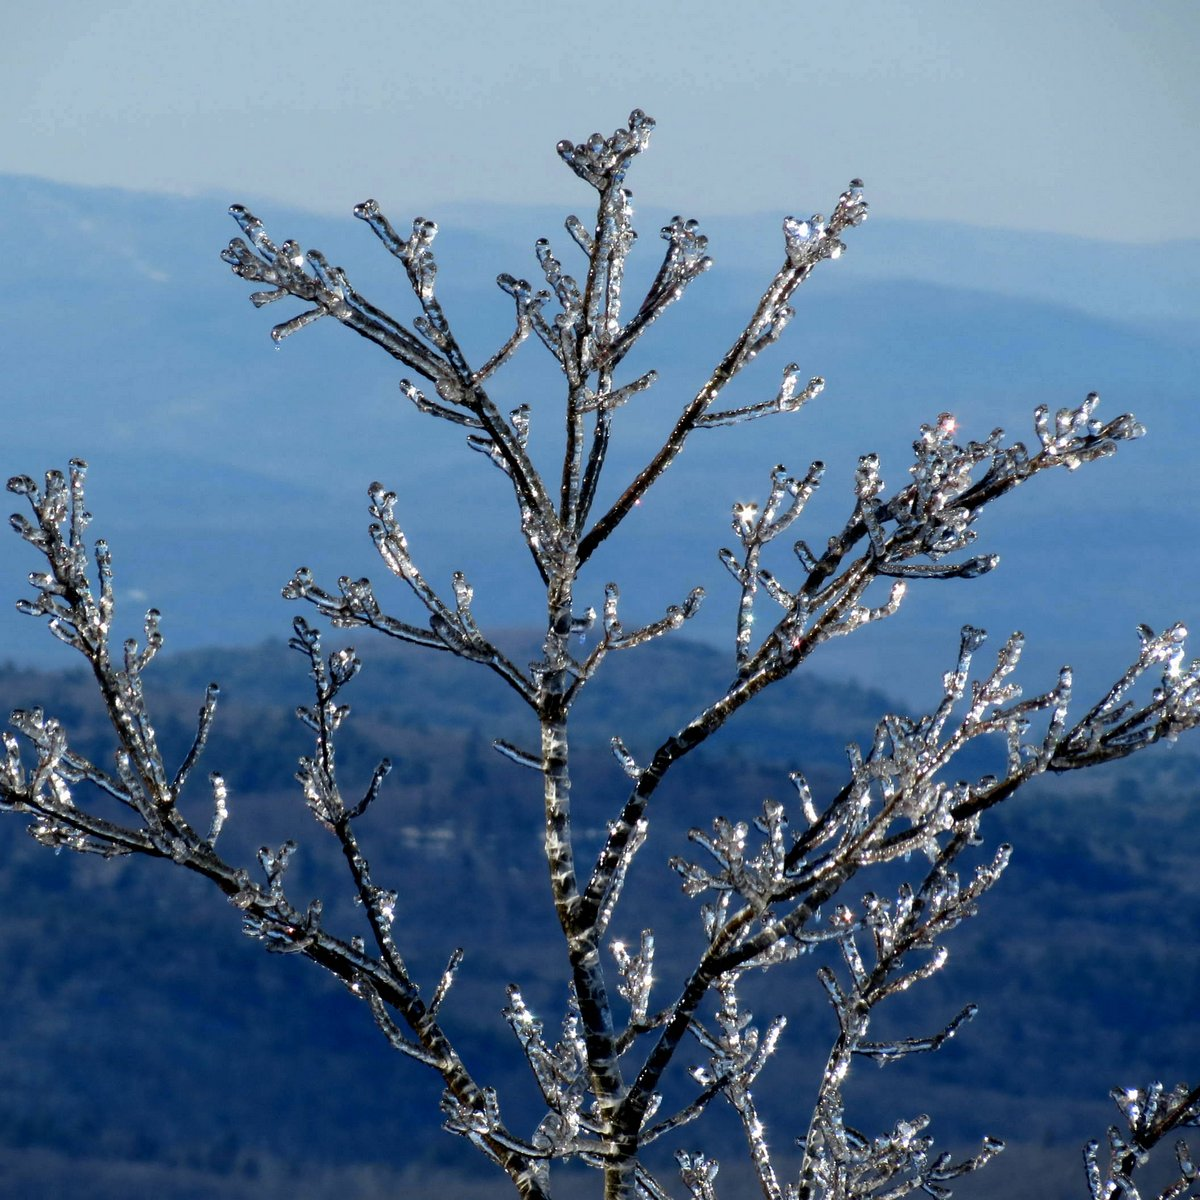 14. Ice Covered Tree